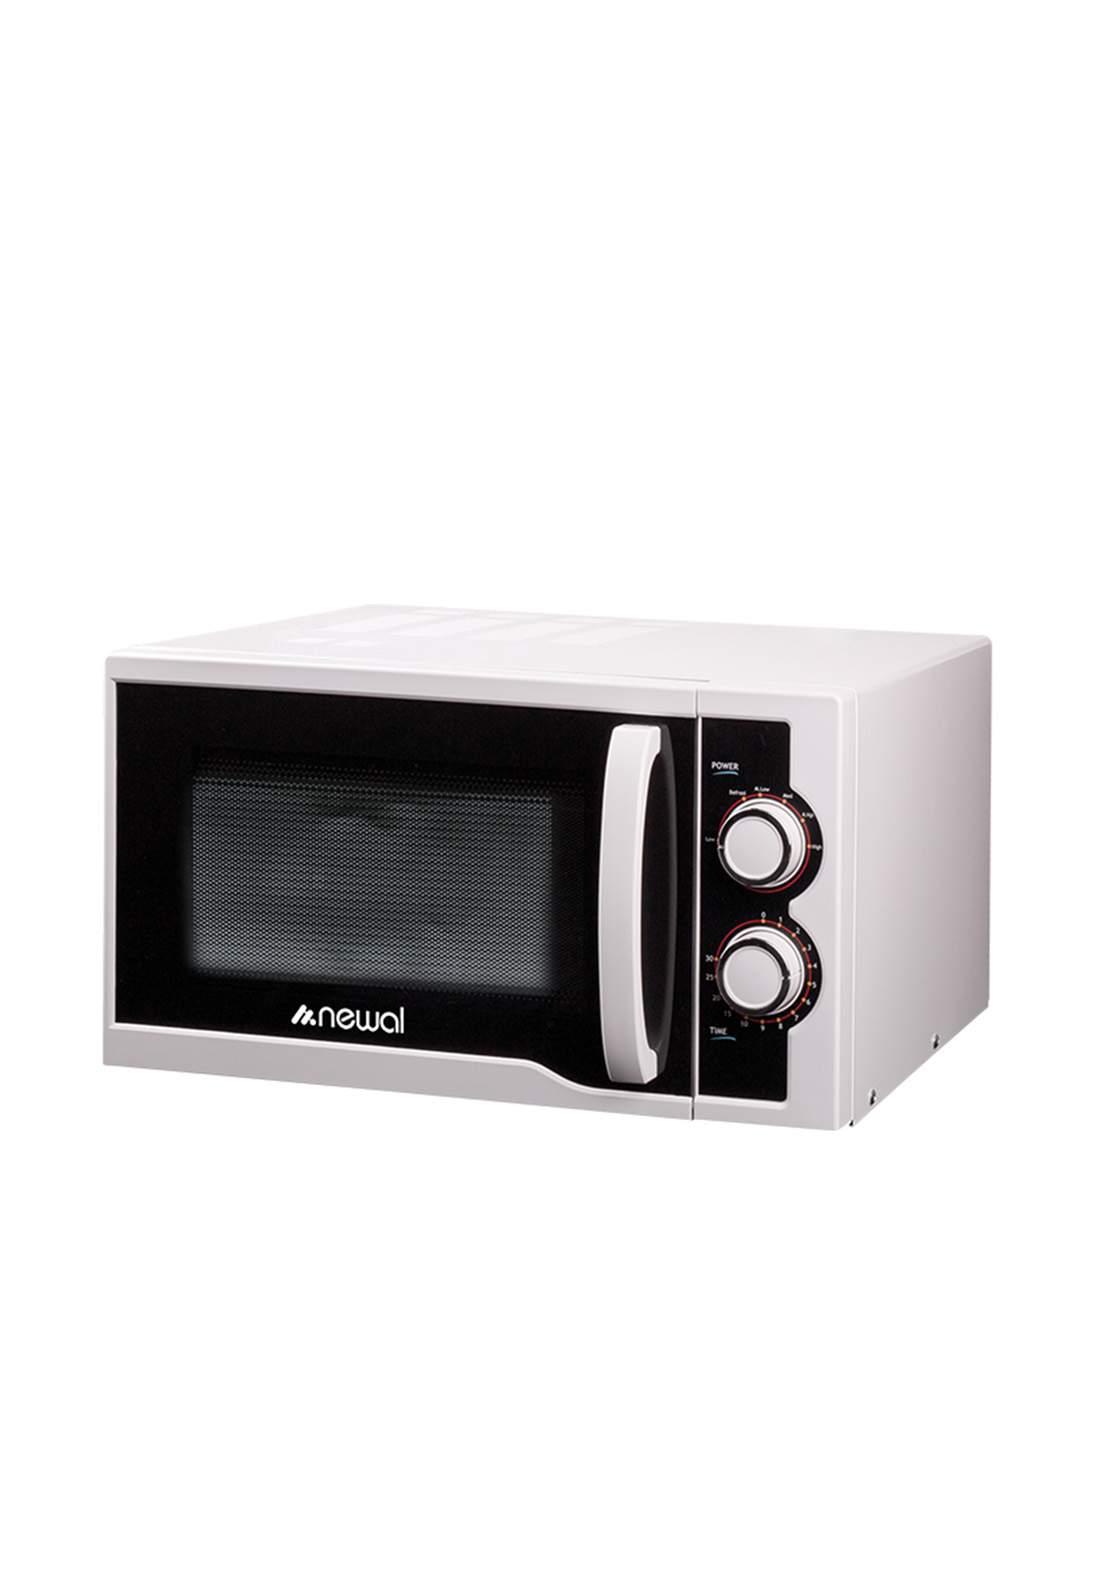 Newal MWO-264 Microvawe Oven 25 L فرن مايكرويف